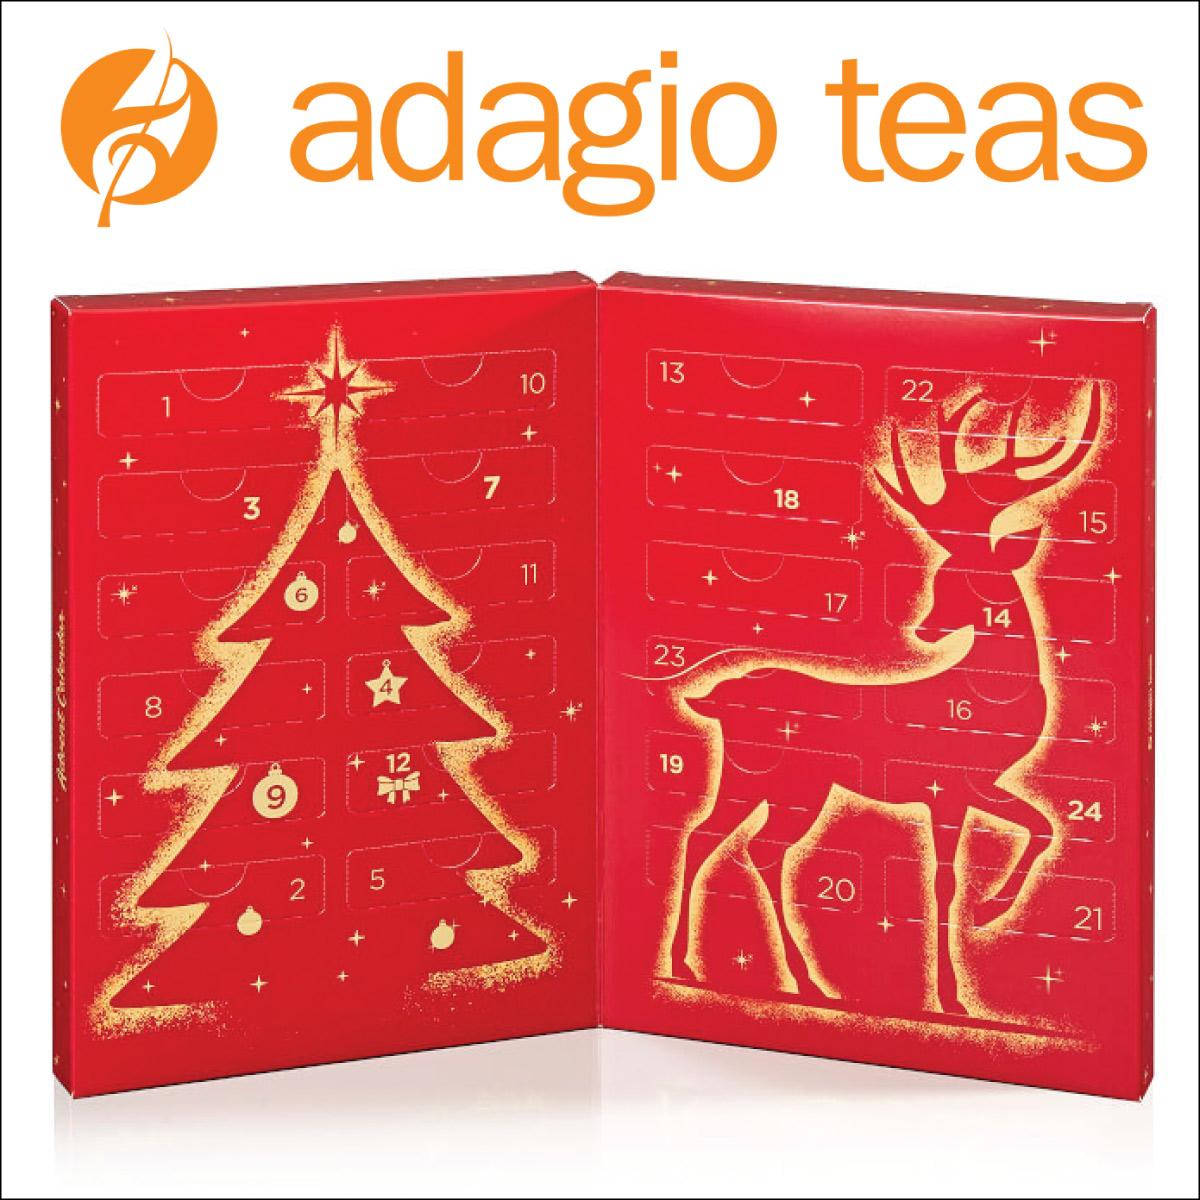 Adagio Tea Advent Calendar